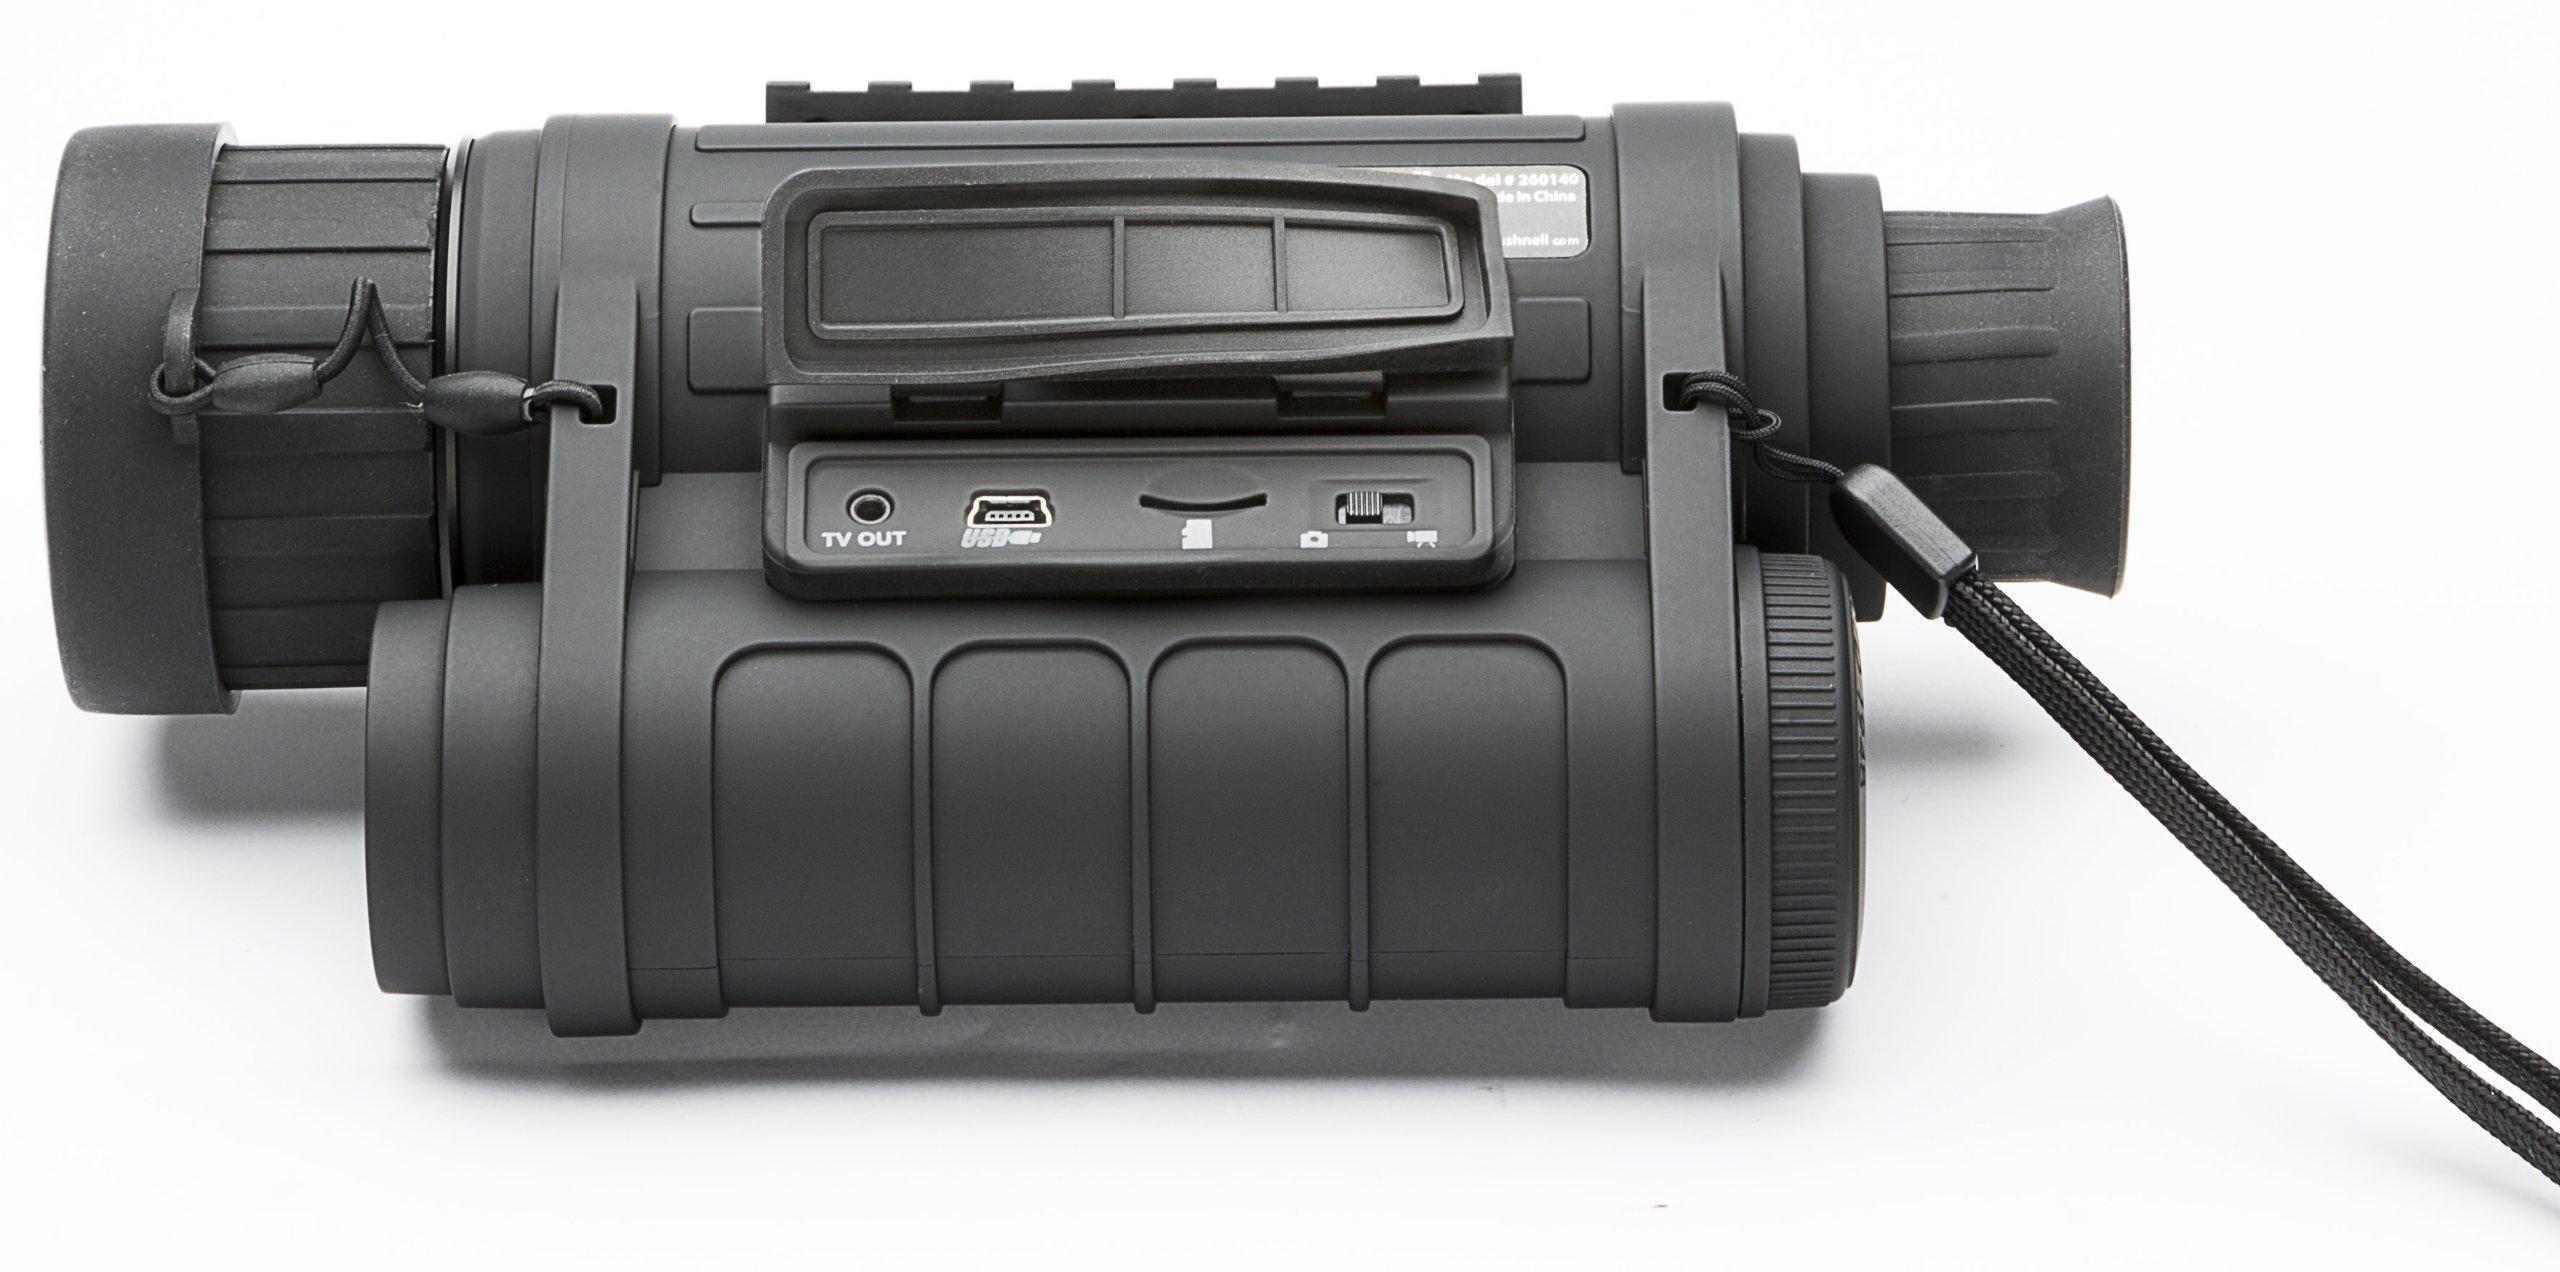 Bushnell Equinox Z Digital Night Vision Monocular, 3 x 30mm by Bushnell (Image #3)